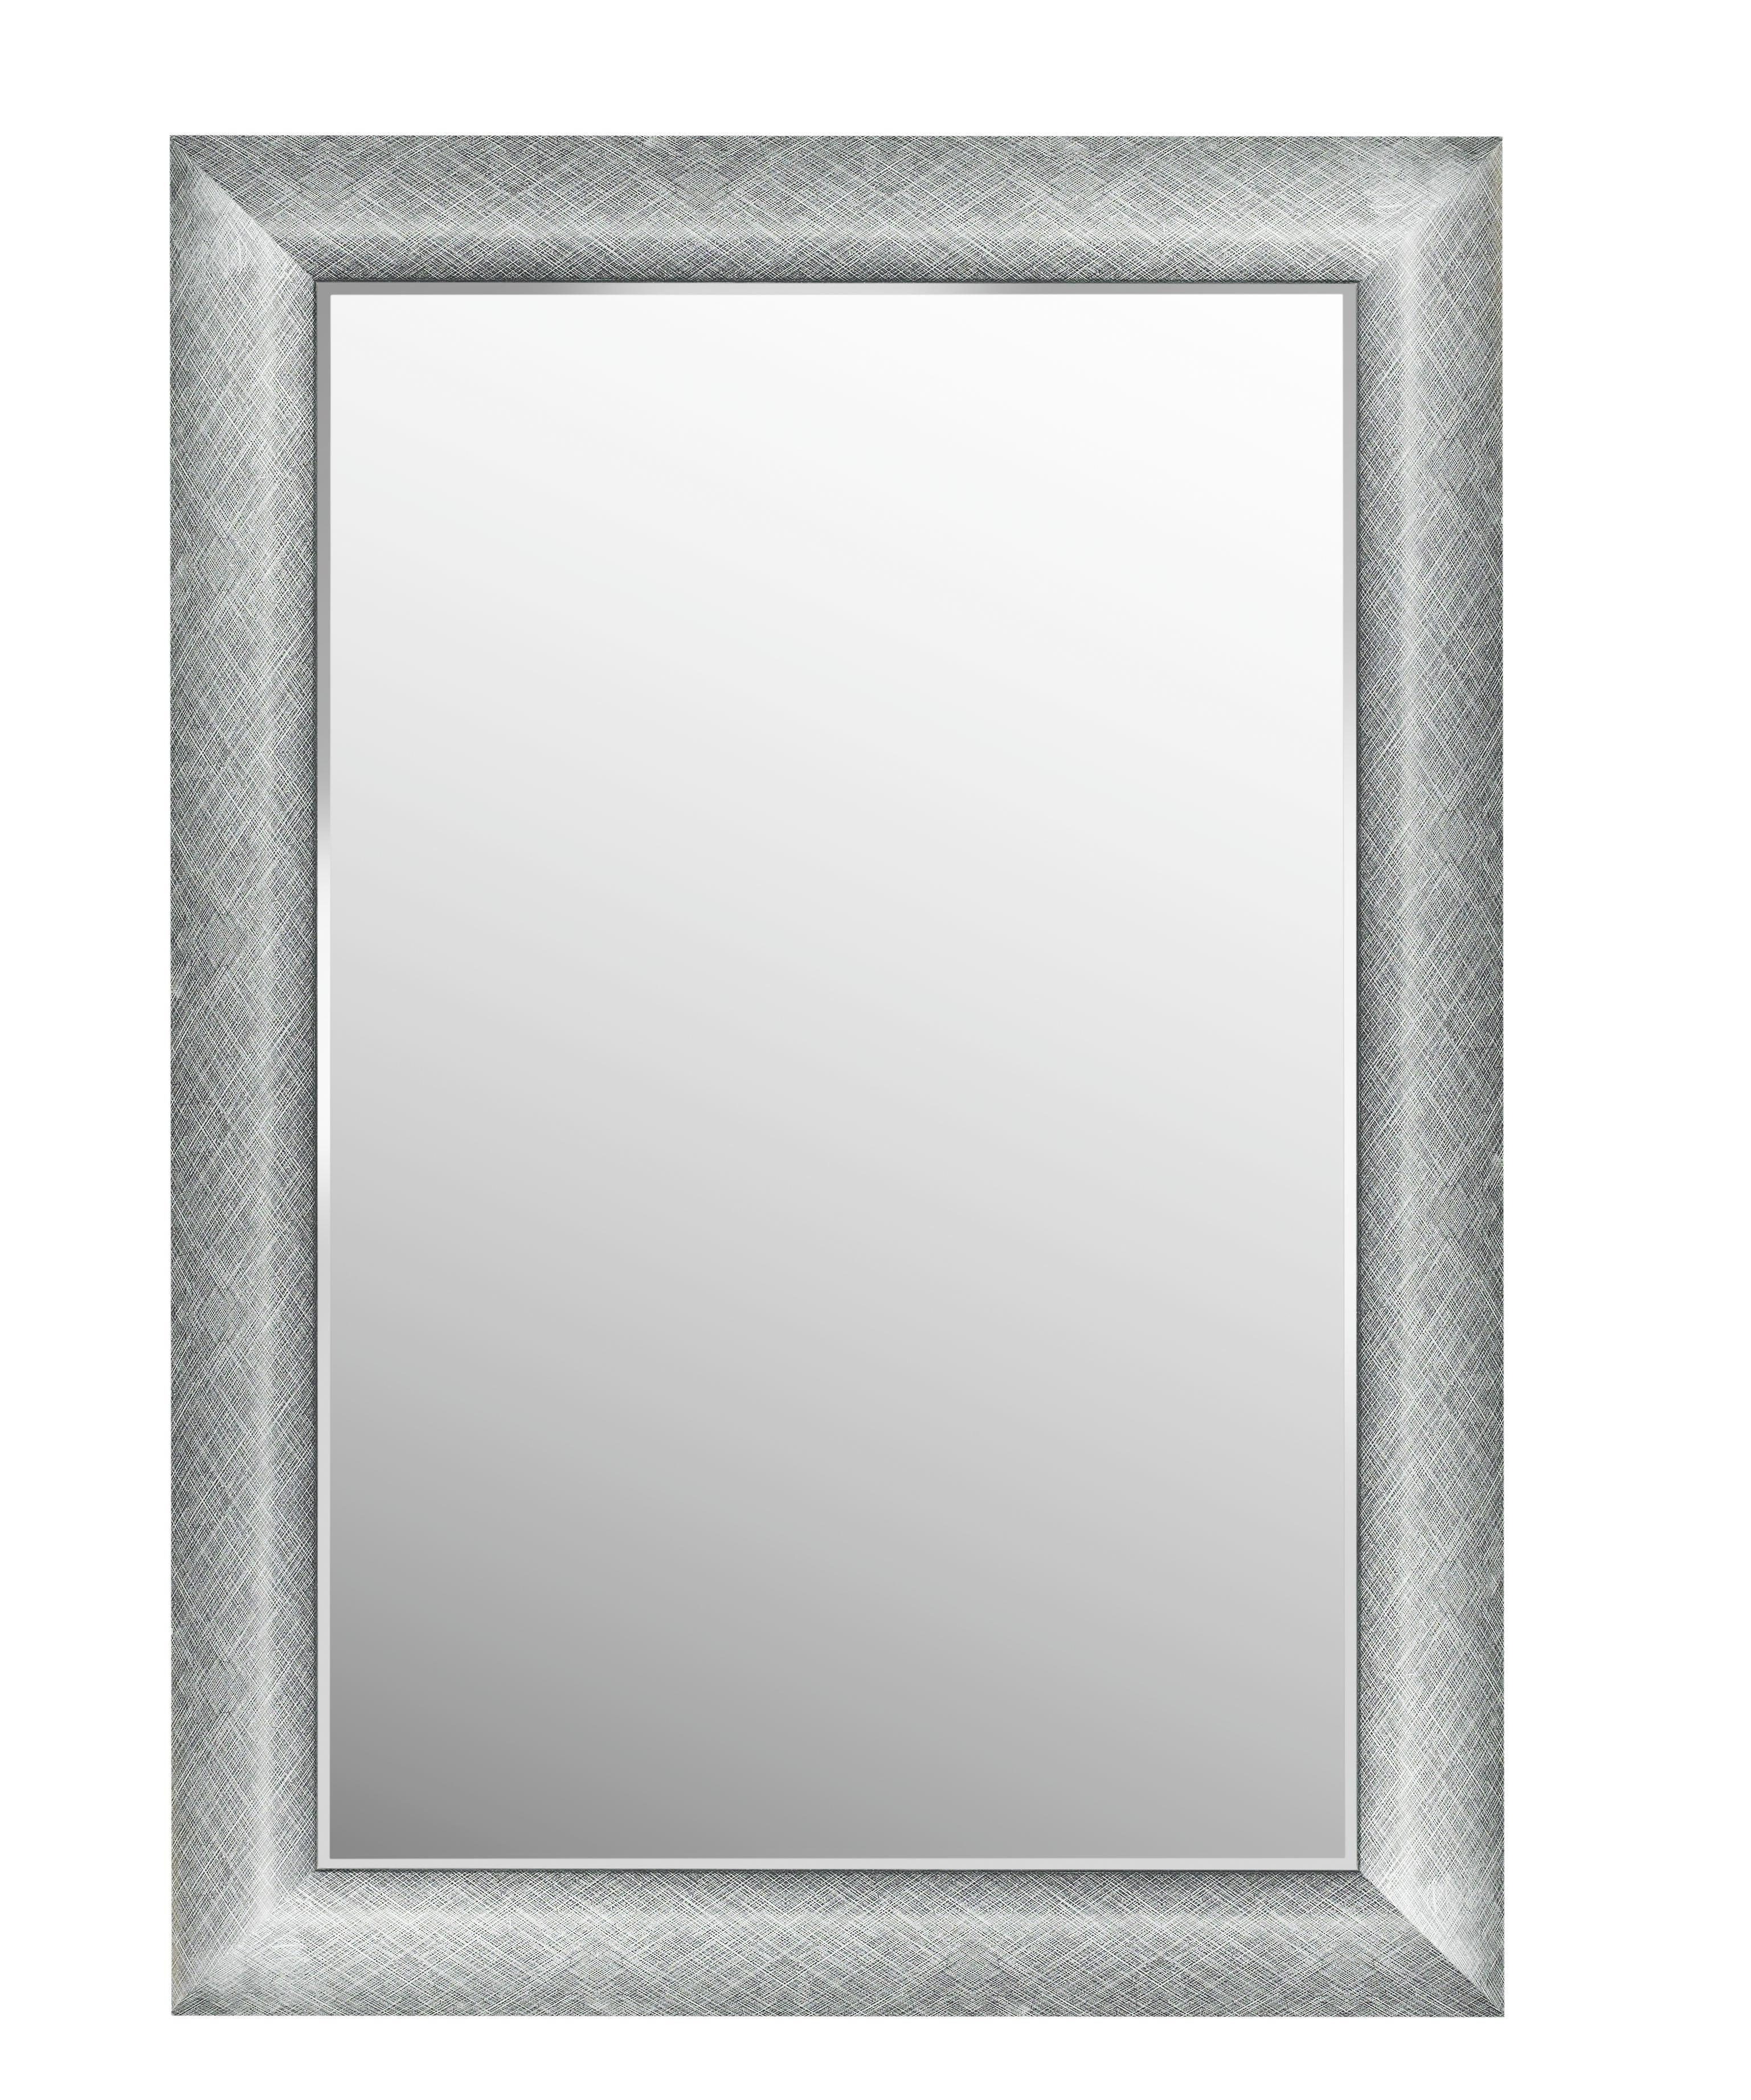 SPIEGEL - Silberfarben, LIFESTYLE, Glas/Kunststoff (63,8/88,8/2,5cm) - LANDSCAPE